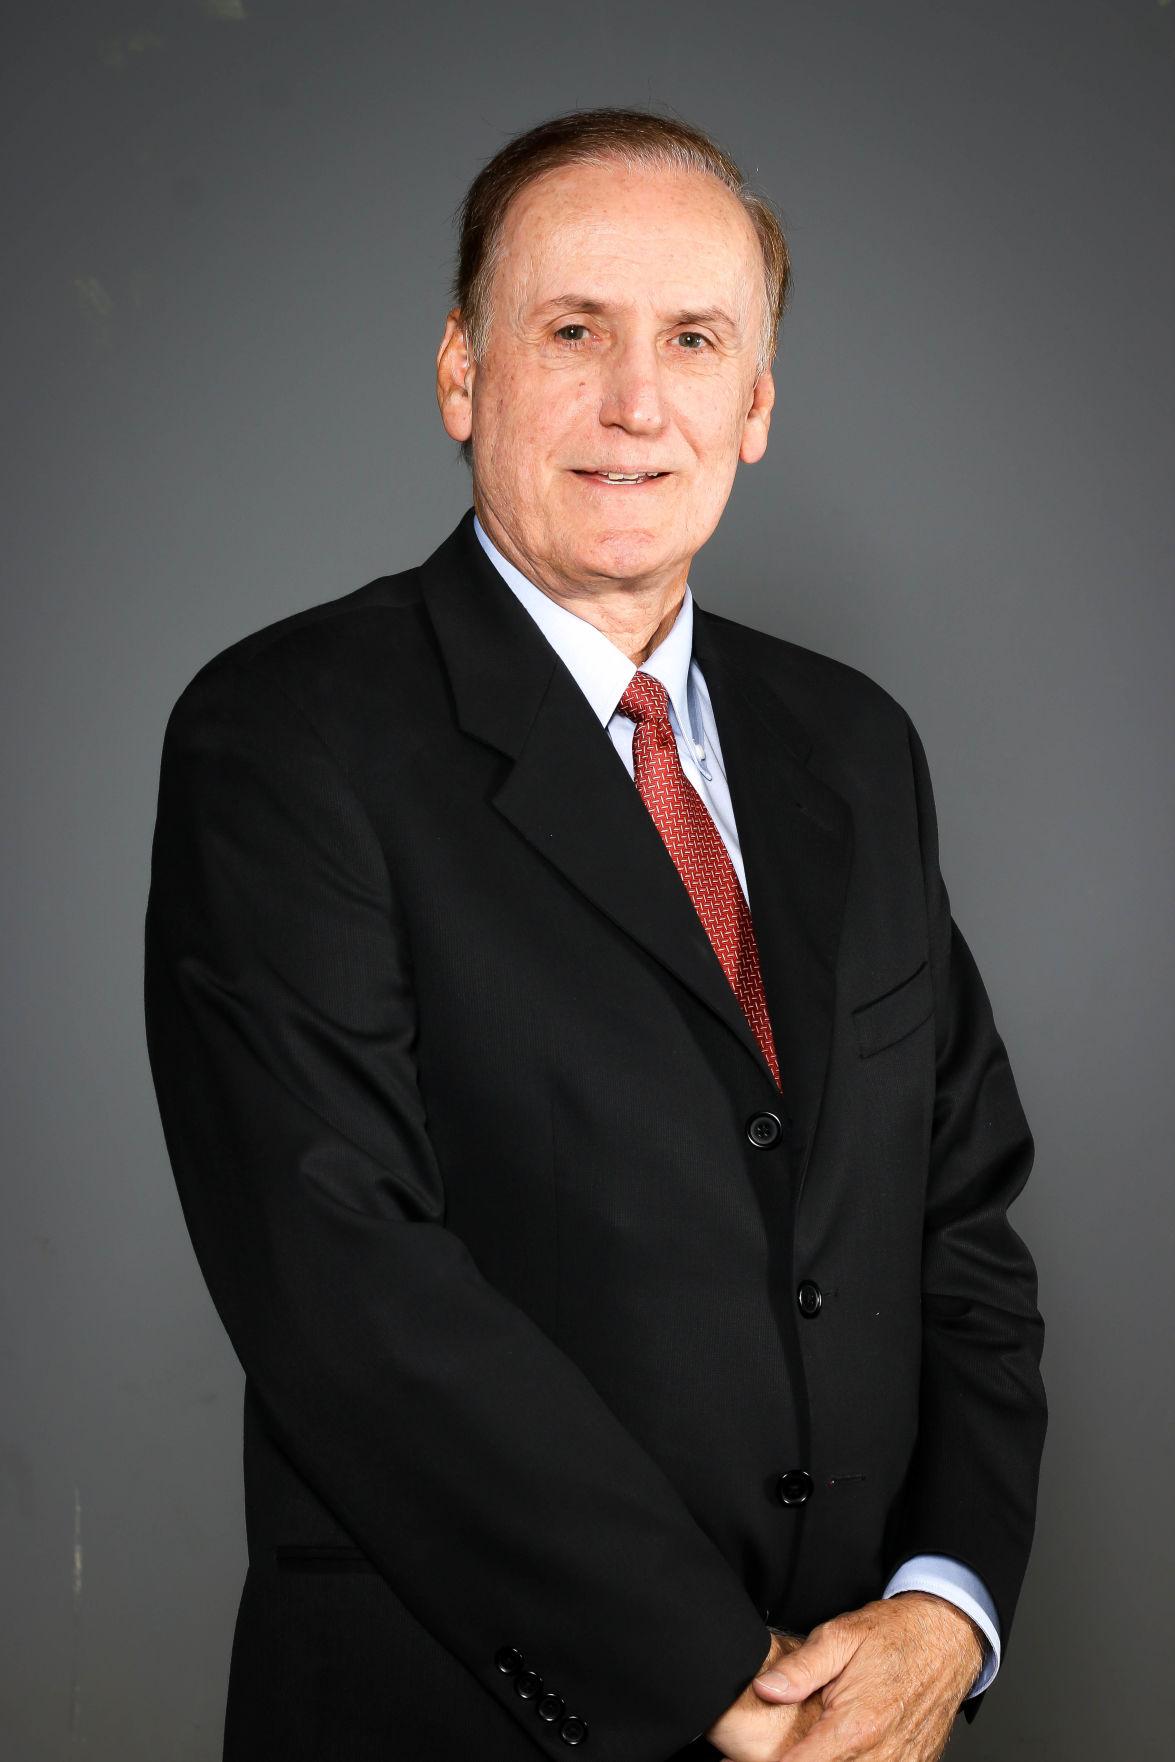 Judge John L. Fielder